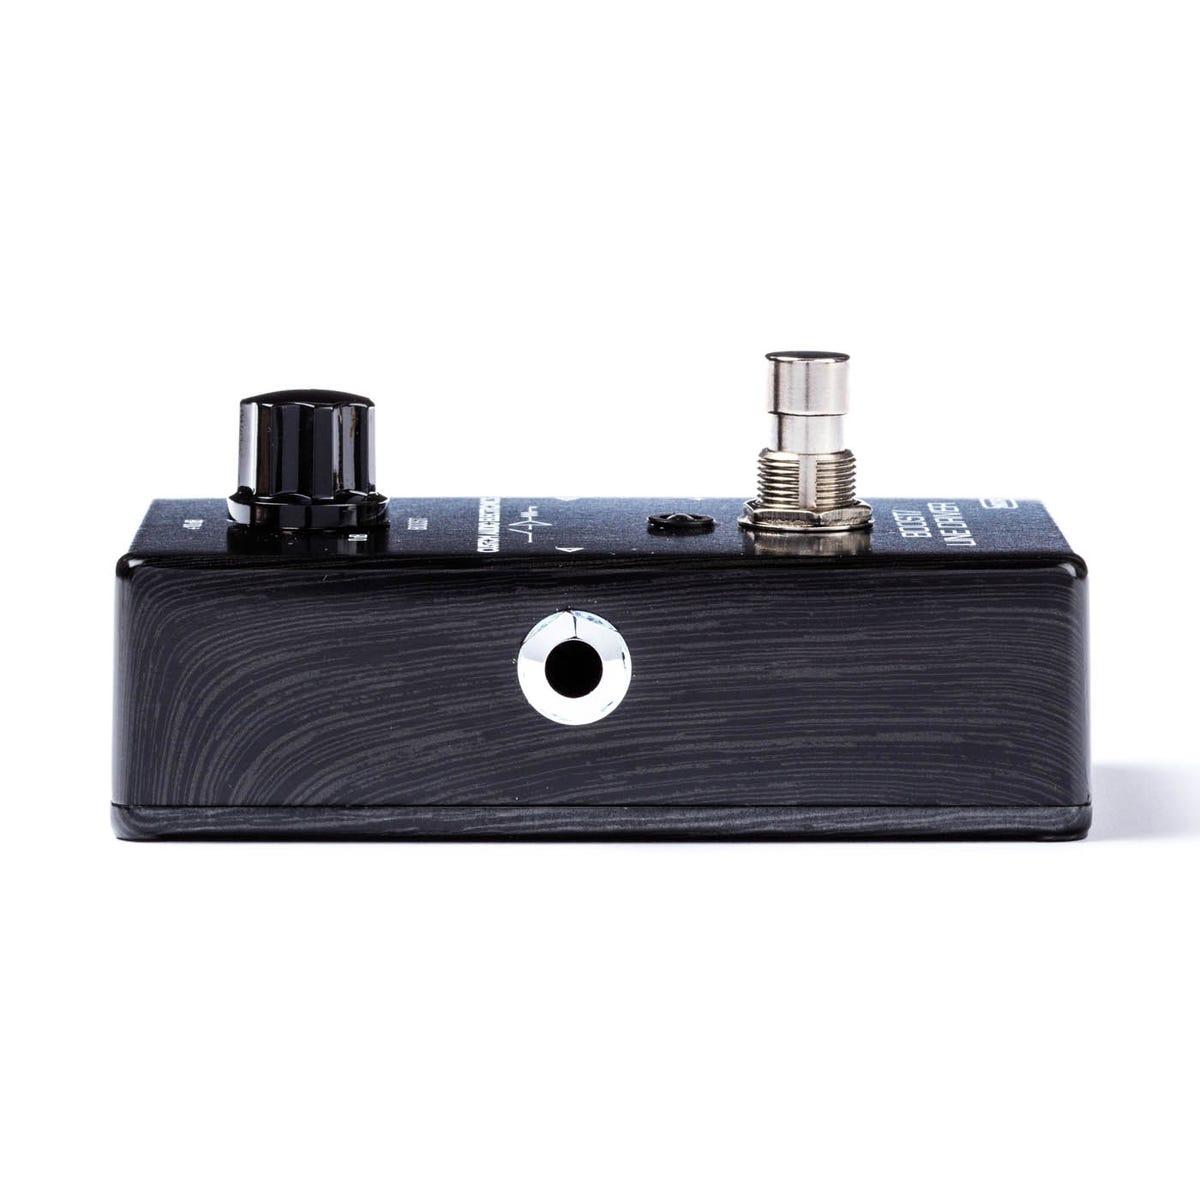 Custom Audio Electronics Boost/Line Driver Pedal